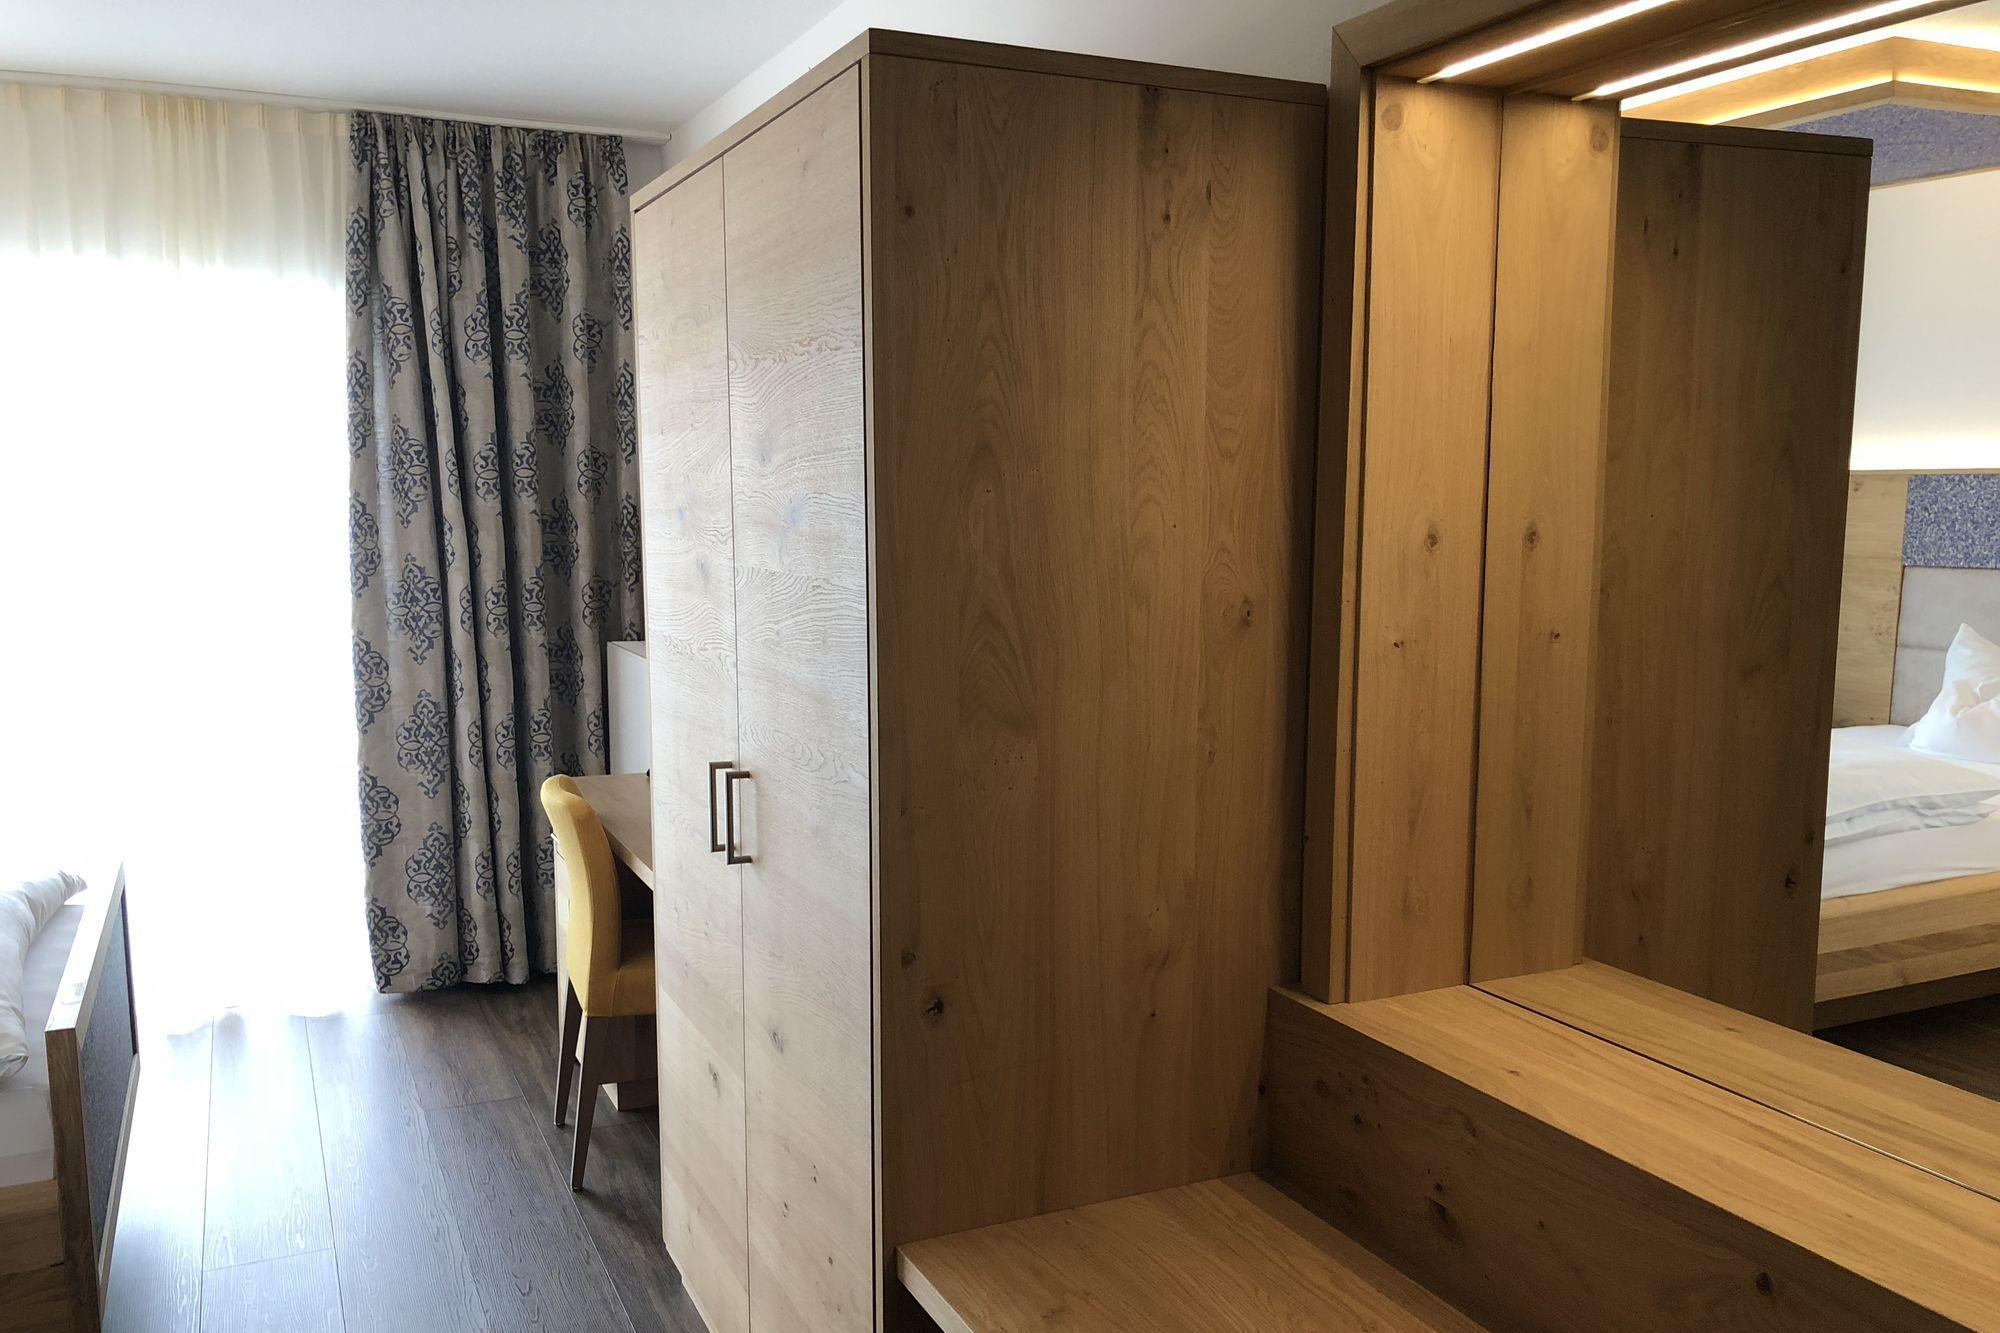 https://www.hotelbinder.de/wp-content/uploads/einzelzimmer2_5.jpg